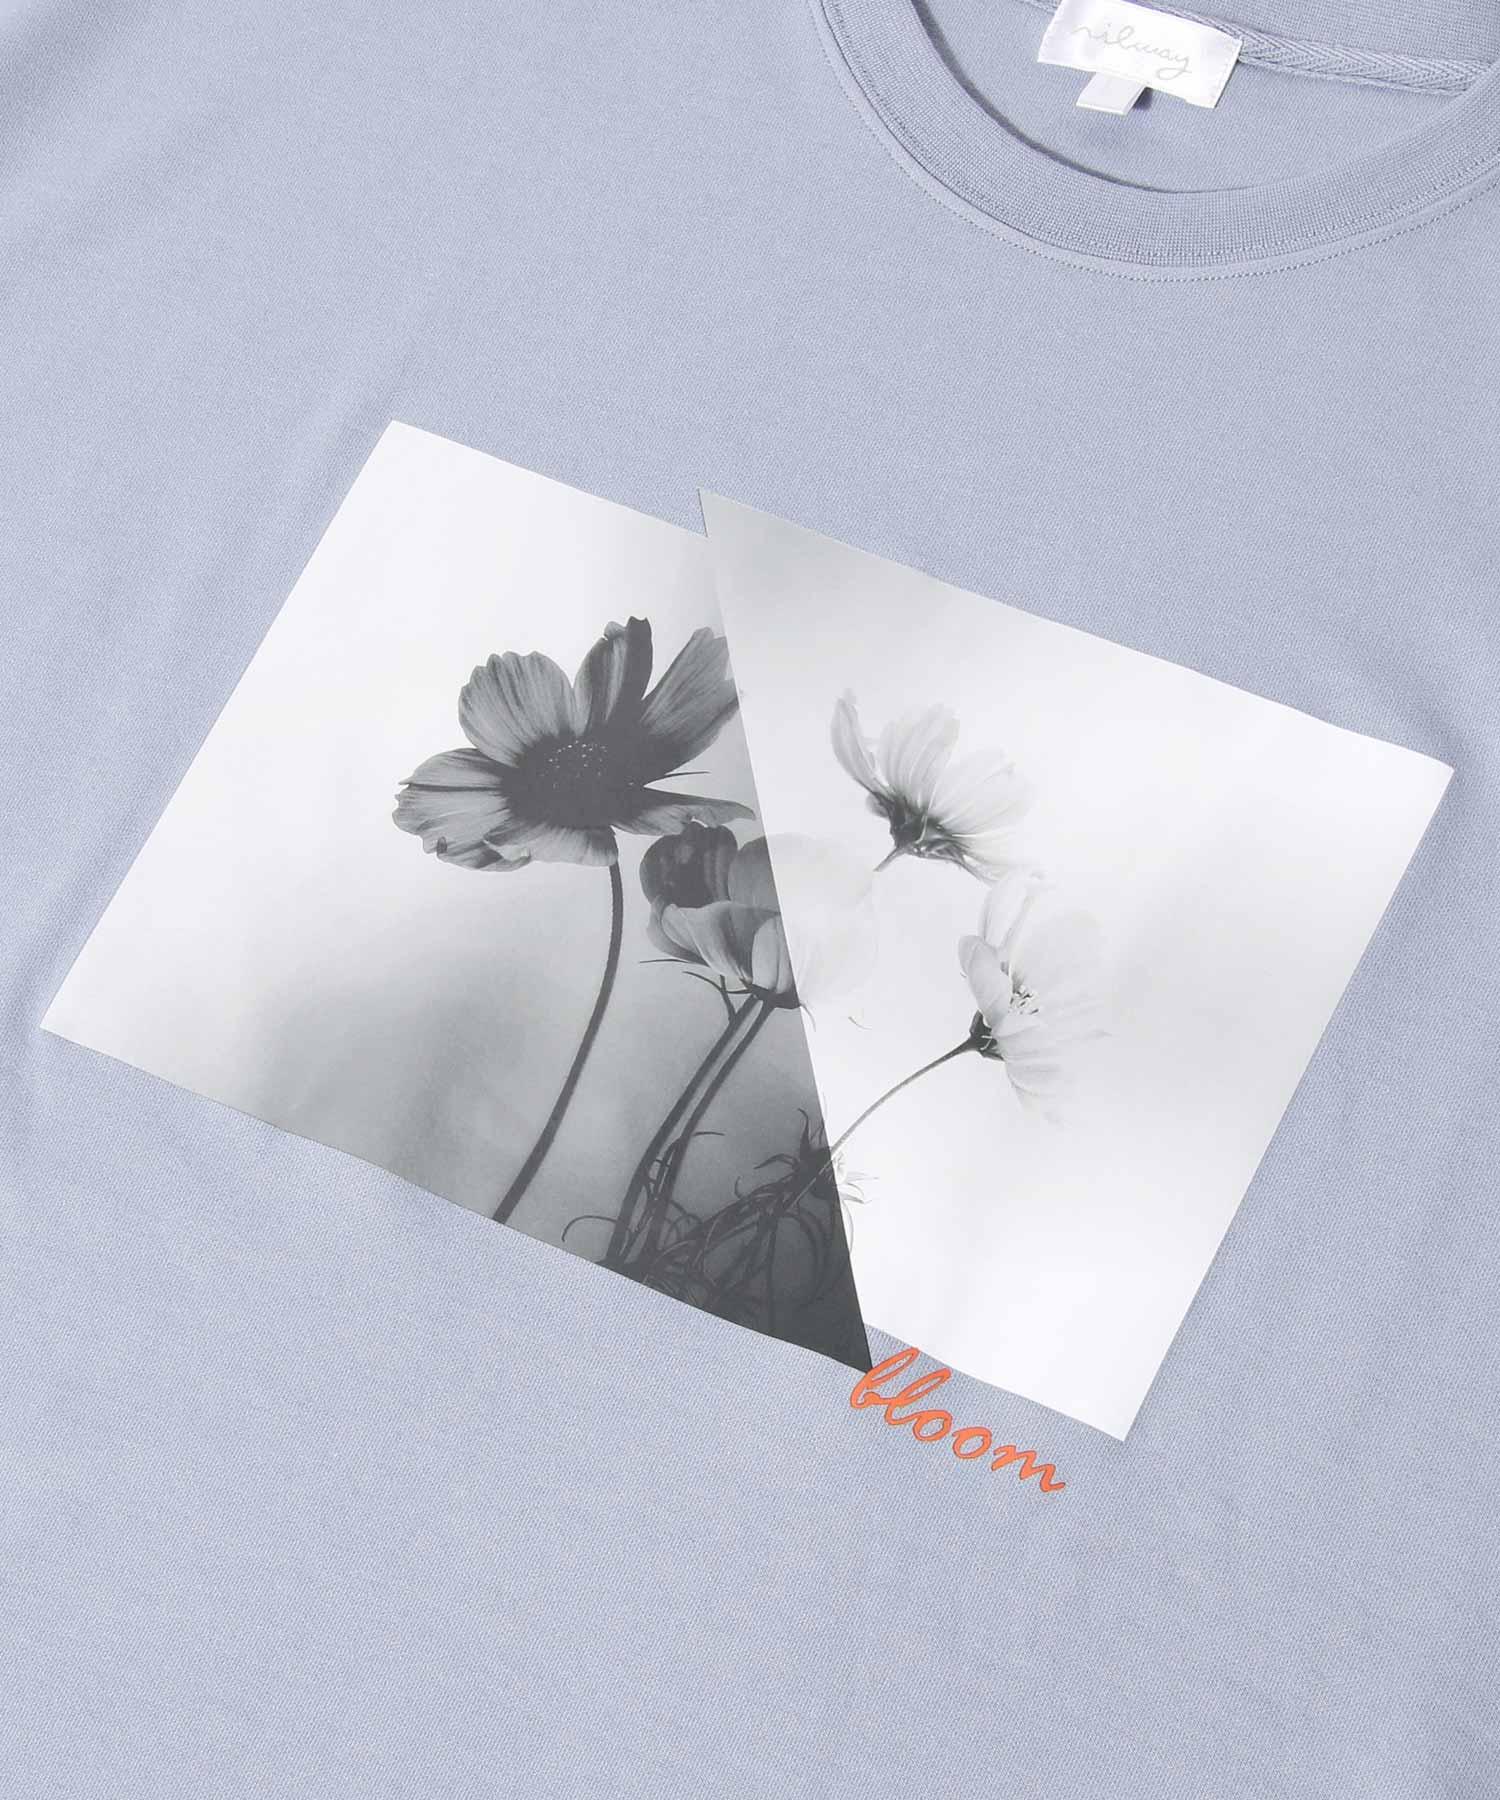 【Nilway】黑白花藝術照T恤 日系 寬版 4